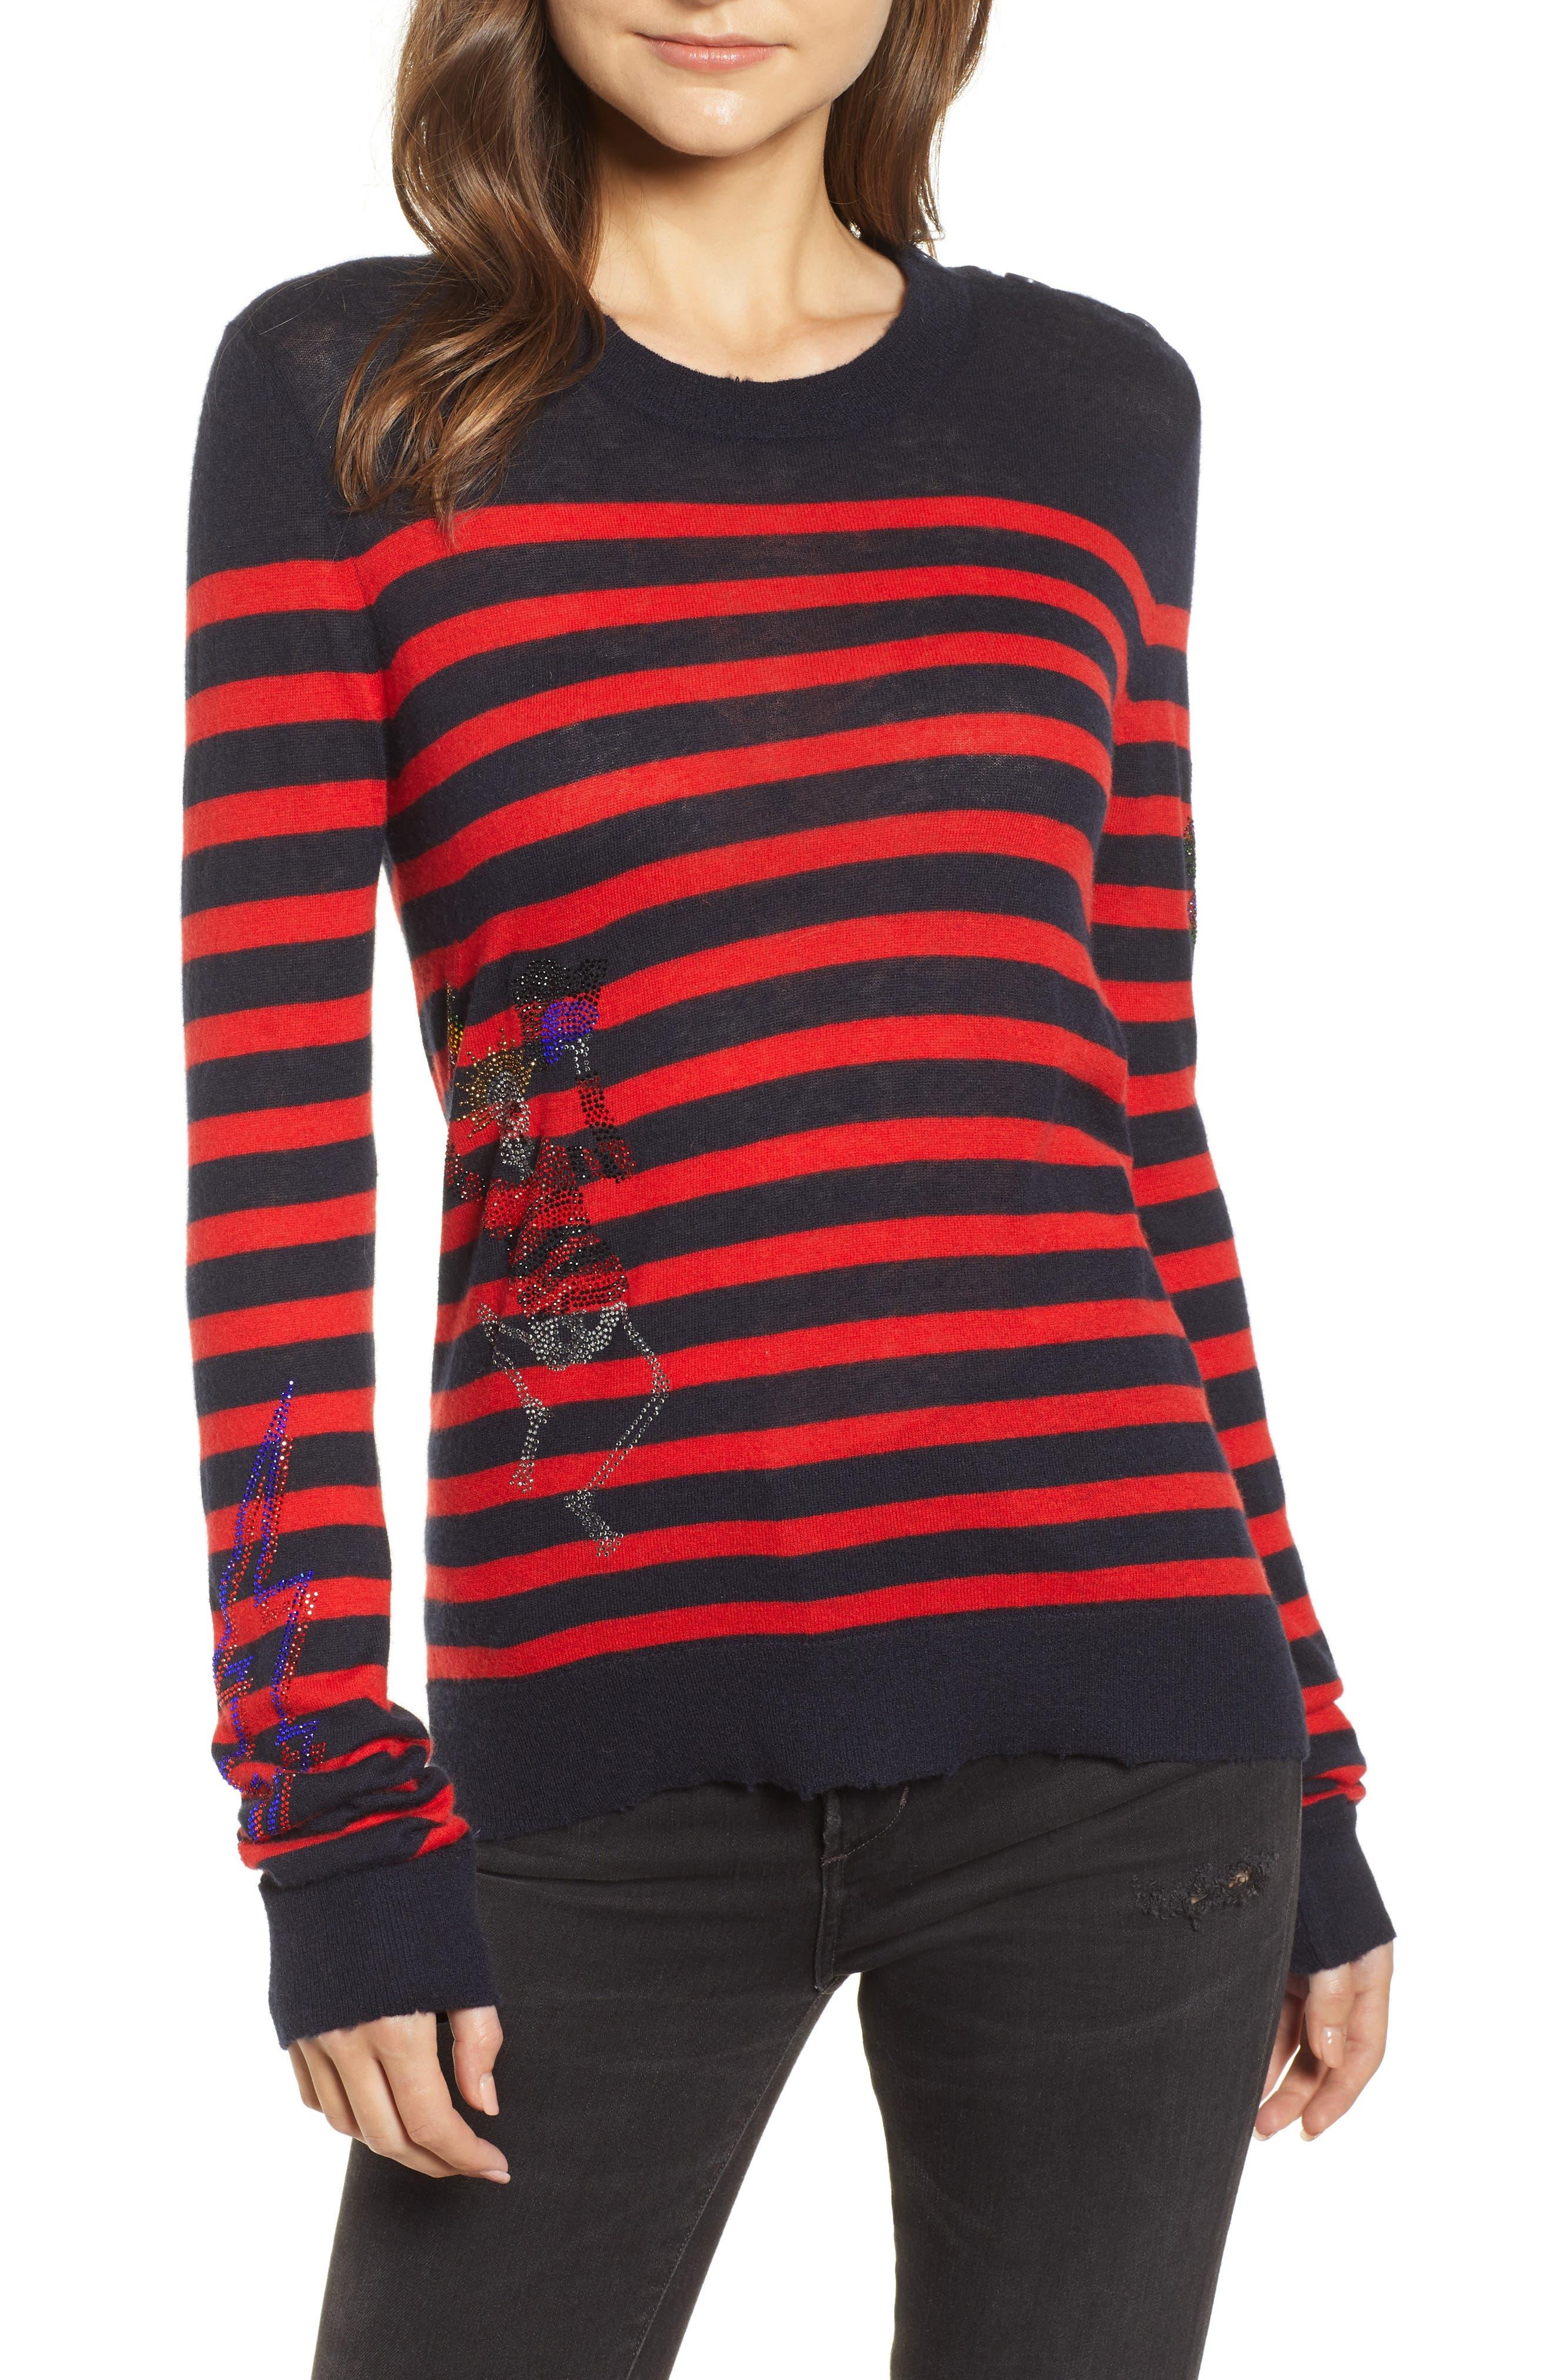 Delly Bis Cashmere Sweater,                             Main thumbnail 1, color,                             ENCRE/ ROUGE